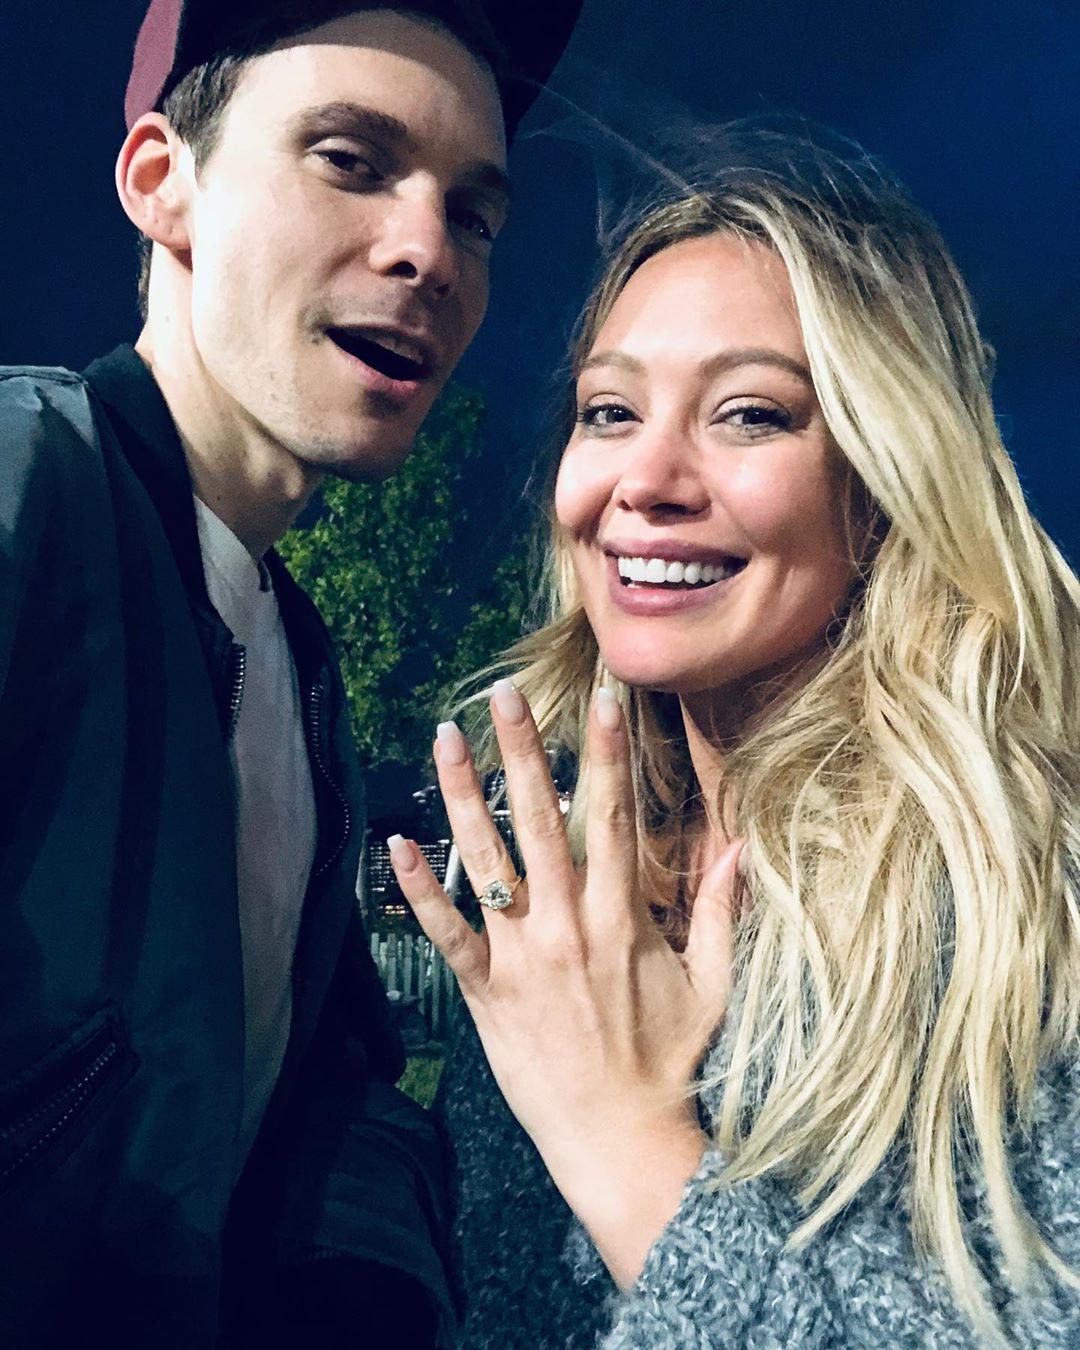 Hilary Duff Engagement Ring Brilliant Earth